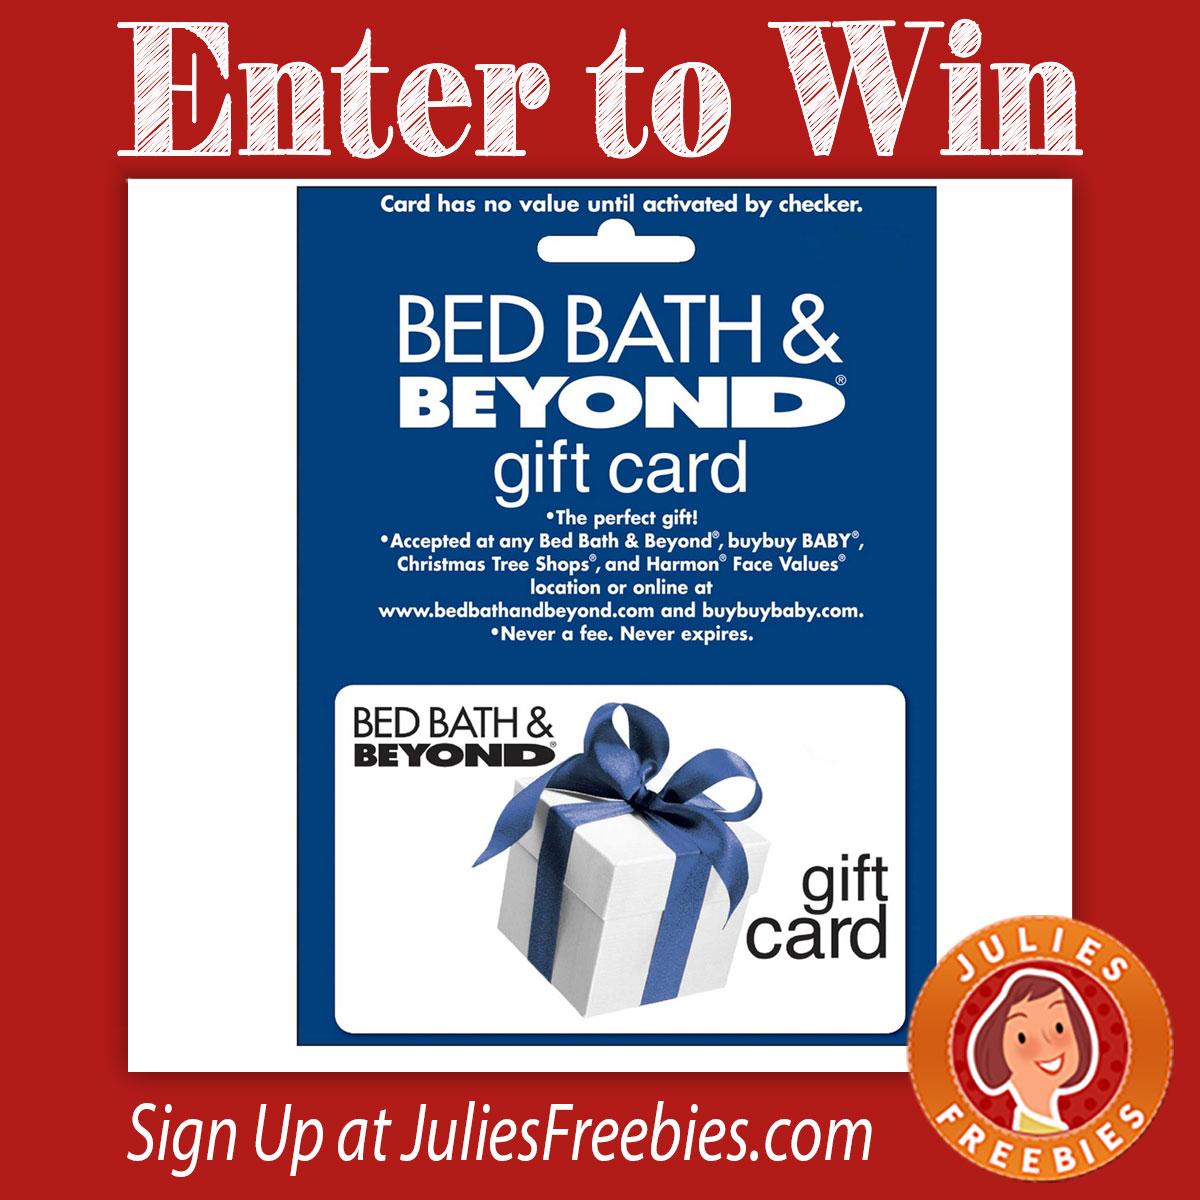 Win a $500 Bed Bath & Beyond Gift Card - Julie's Freebies